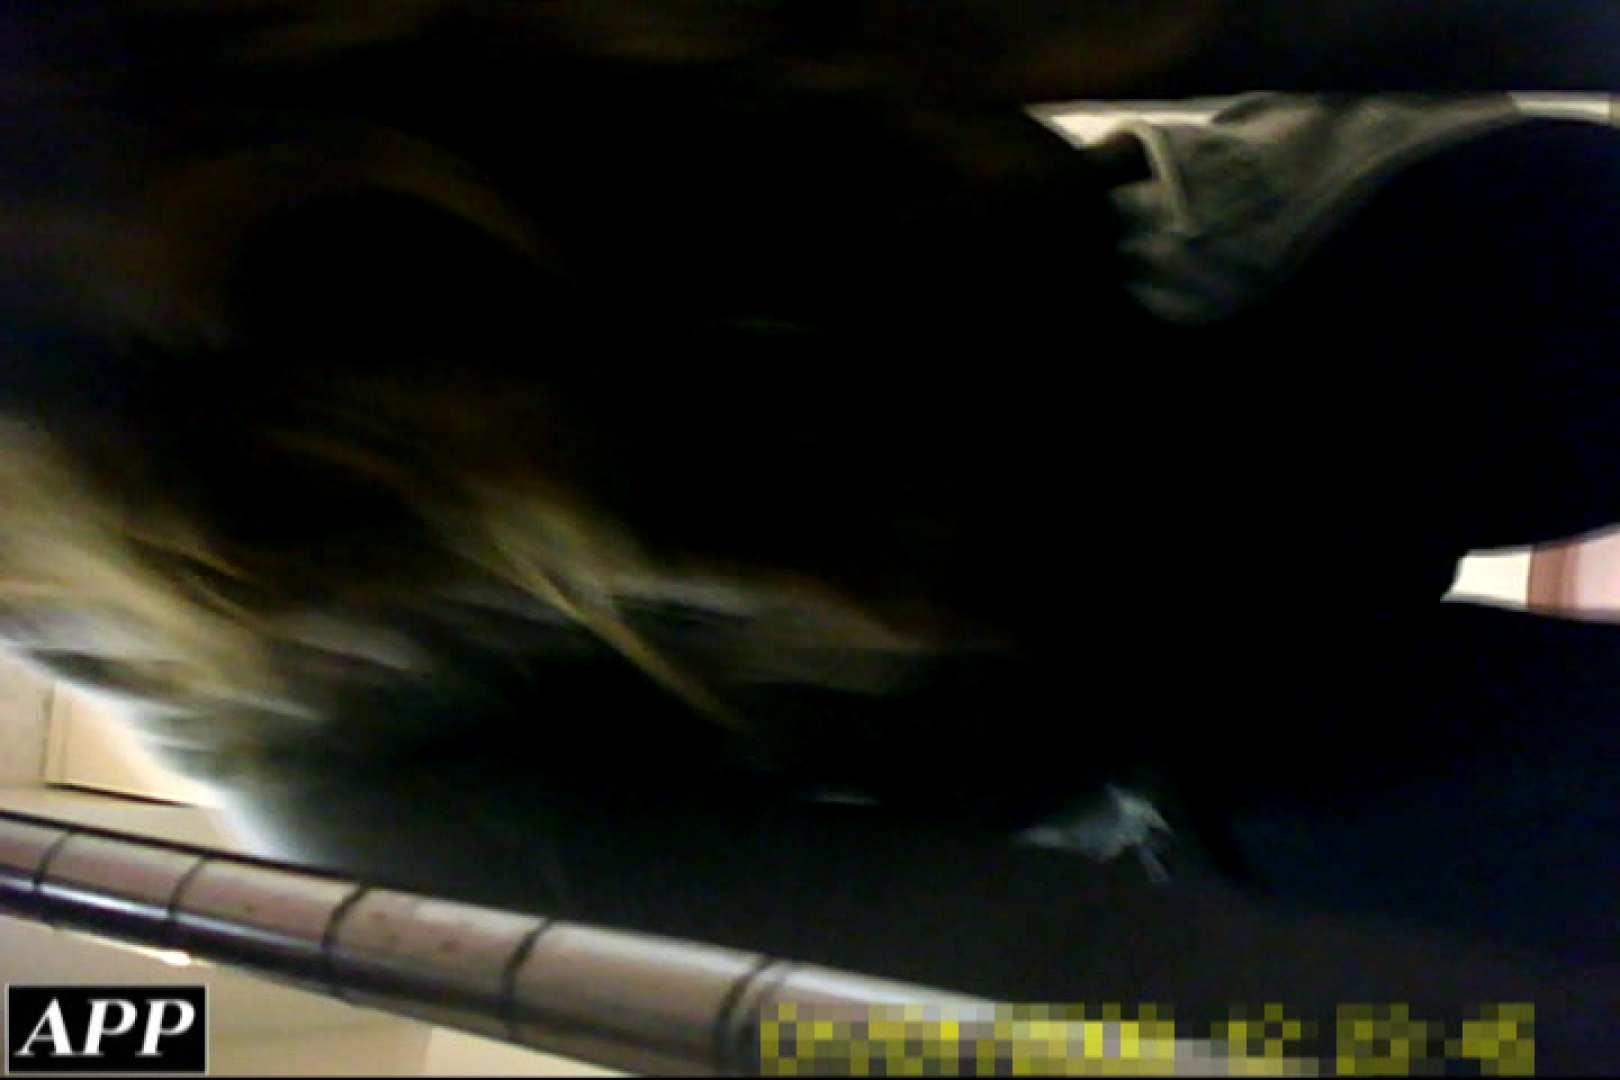 3視点洗面所 vol.17 肛門攻め オマンコ無修正動画無料 84画像 27